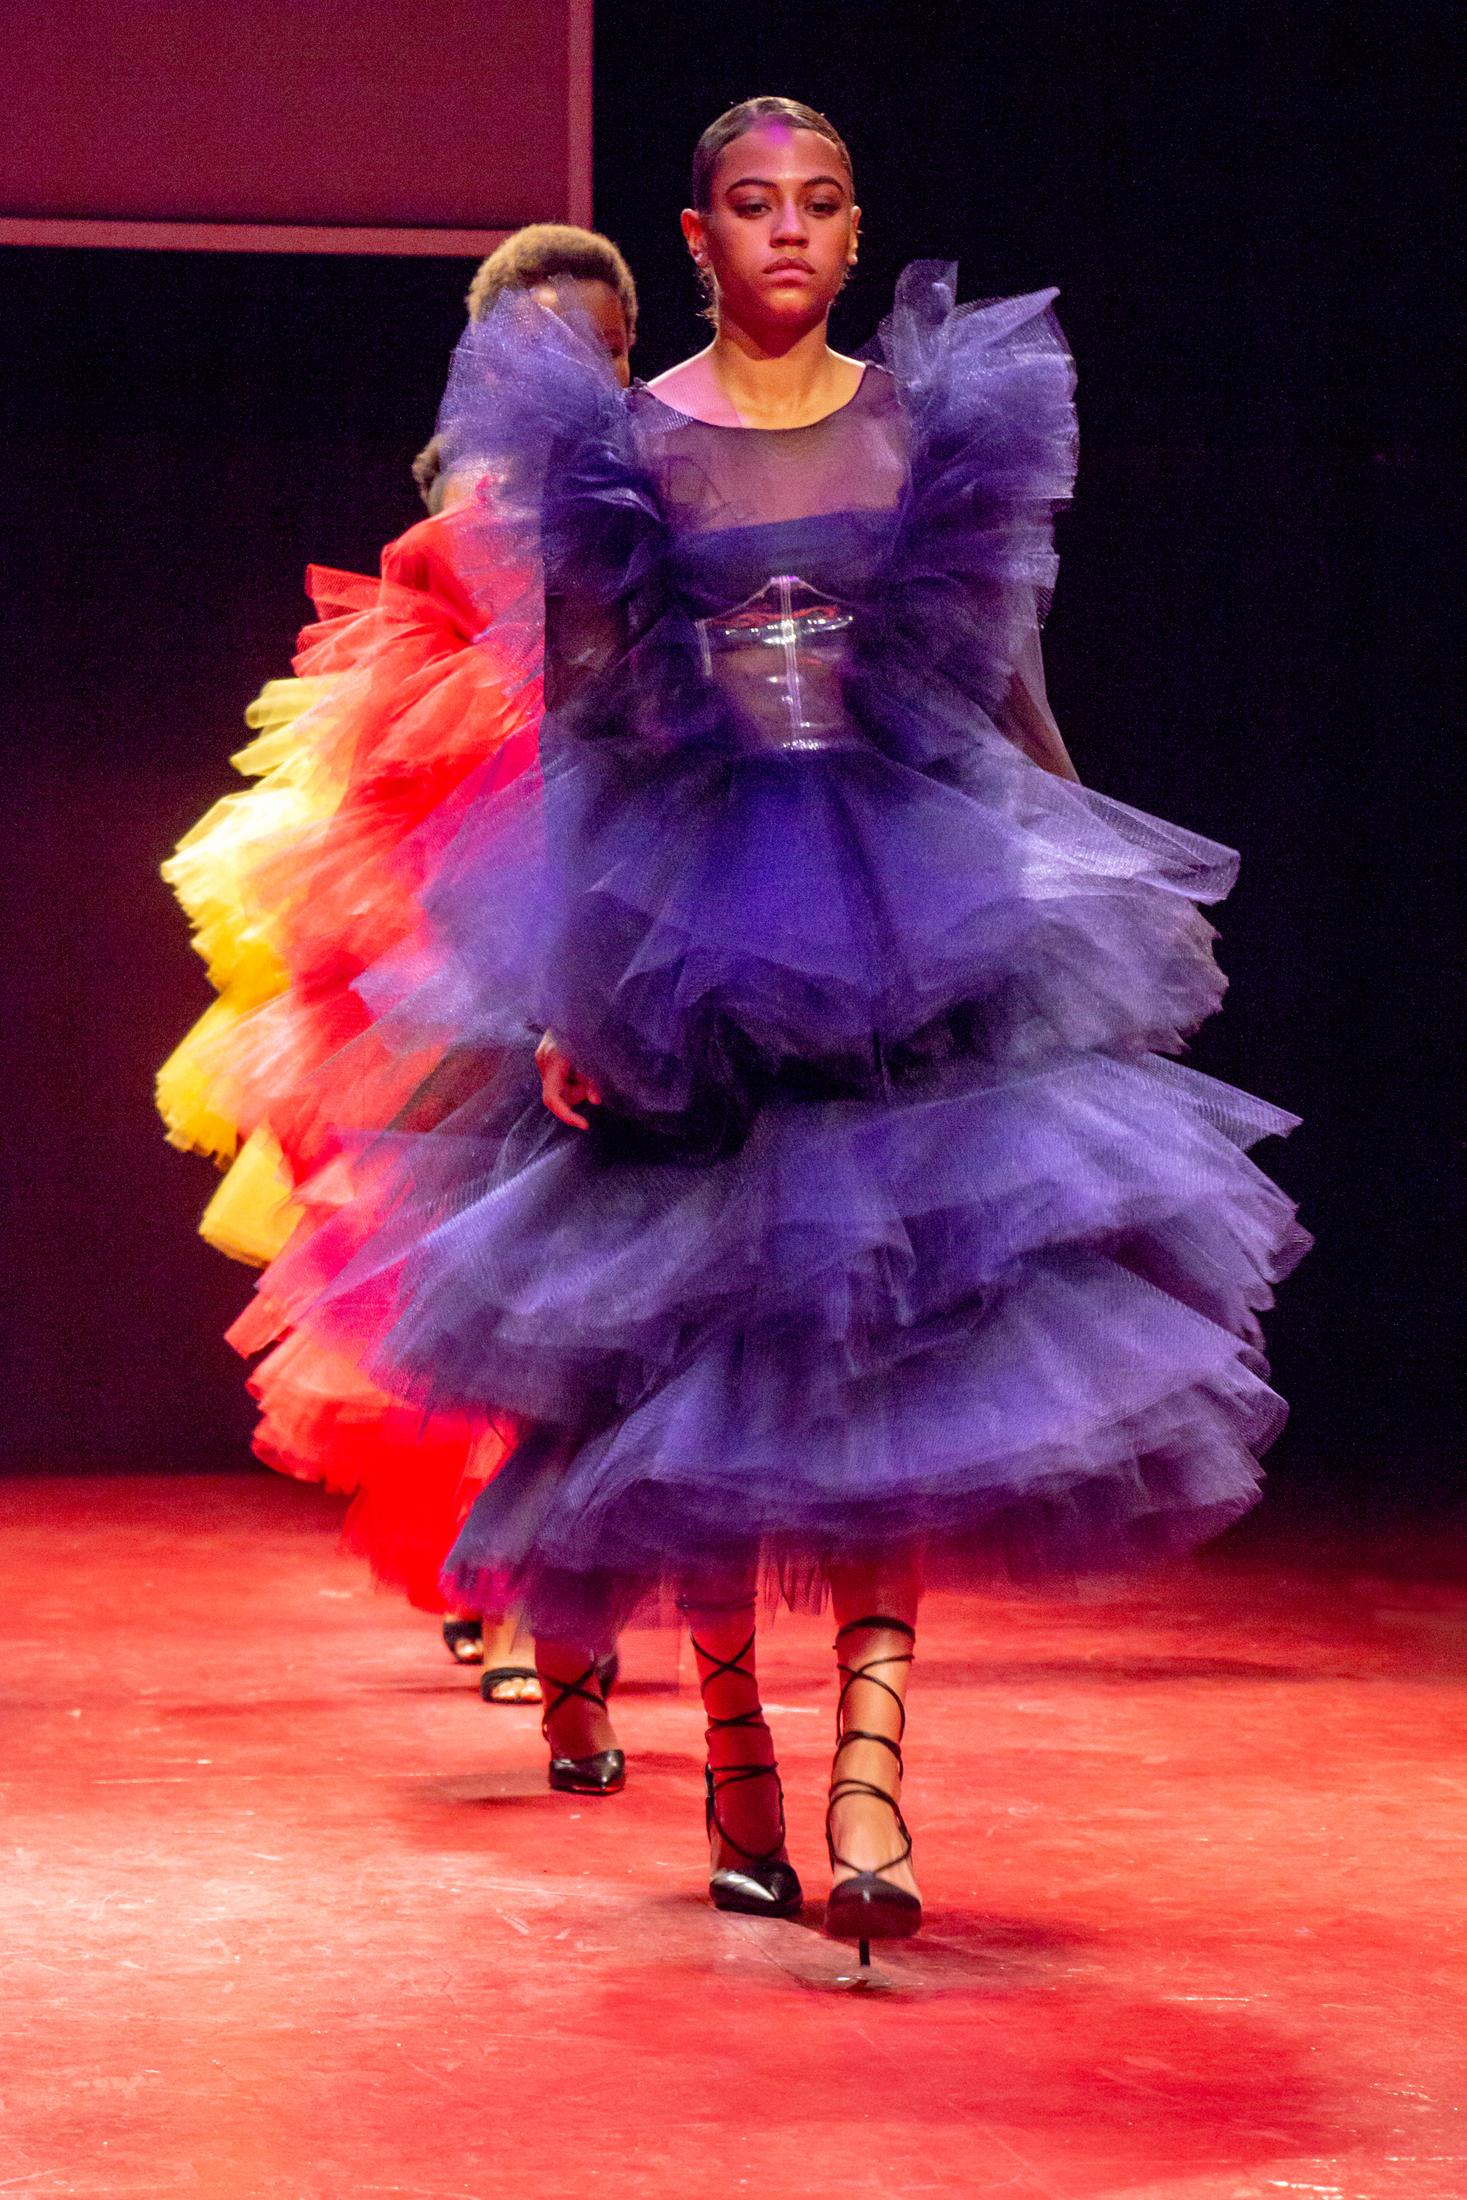 OSA-Fashion-Nyah Ginwright-PicGregGutbezahl-016.jpg